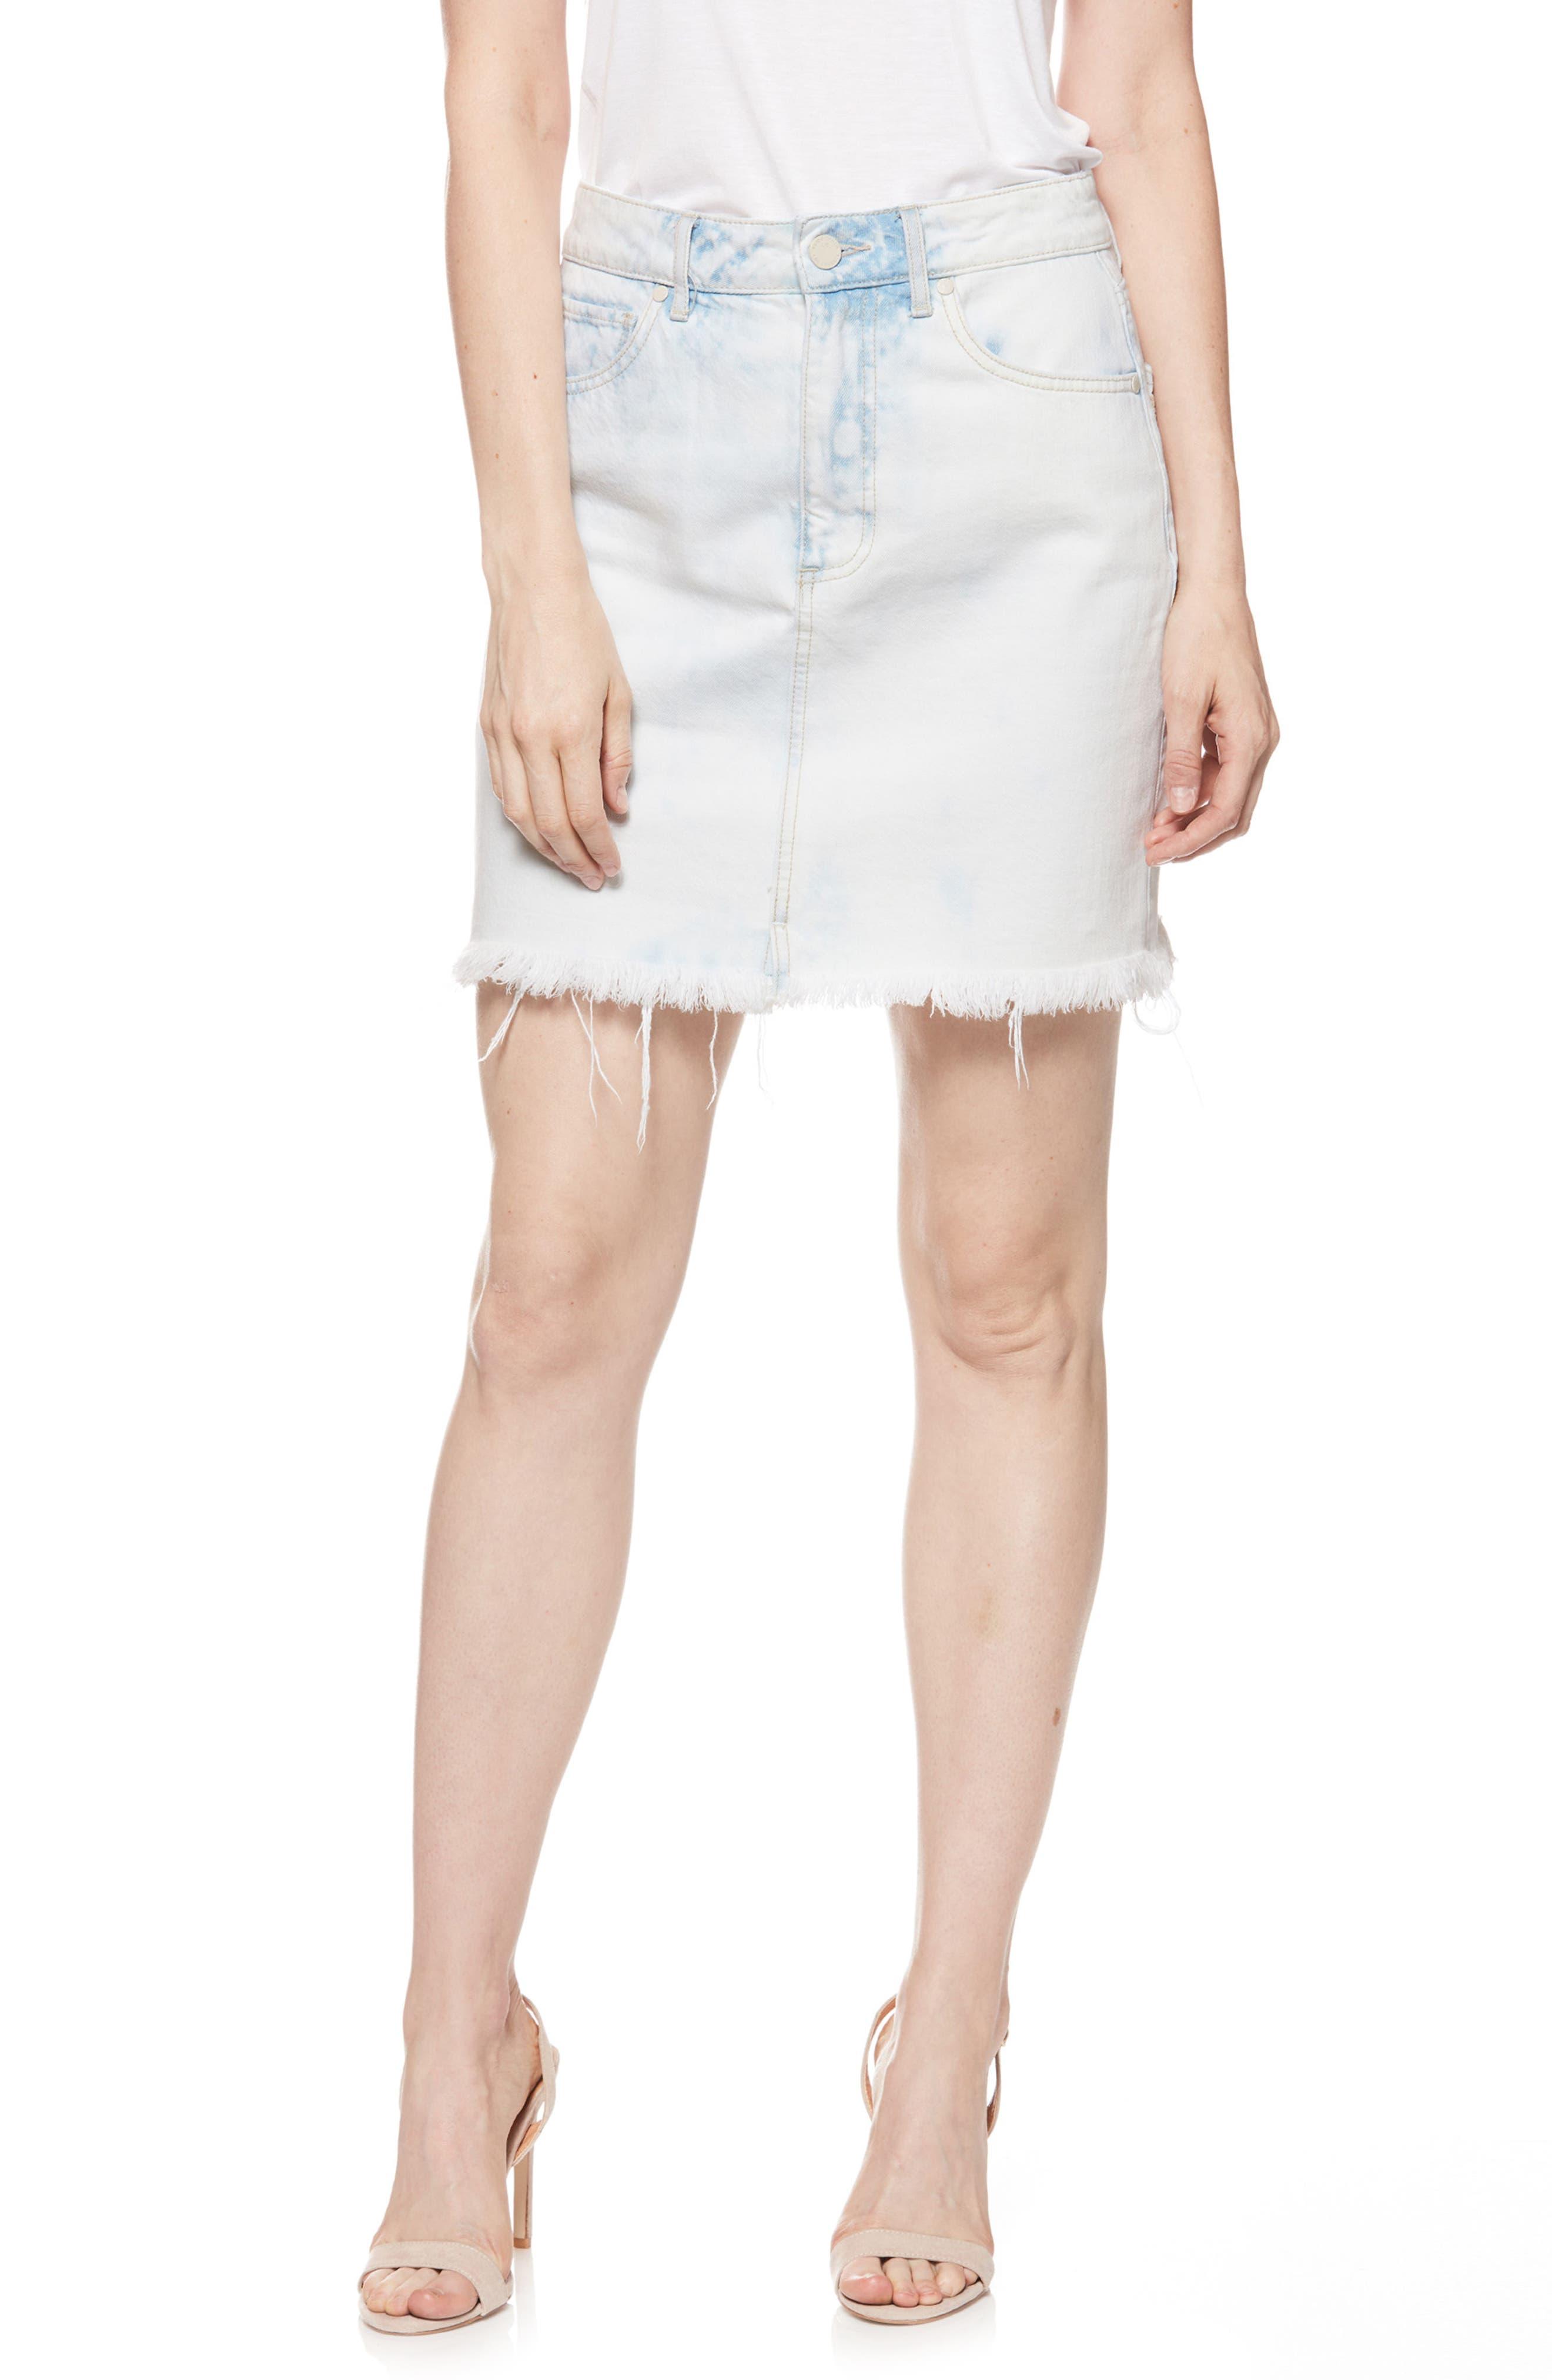 PAIGE Jamine High Waist Denim Skirt, Main, color, 400